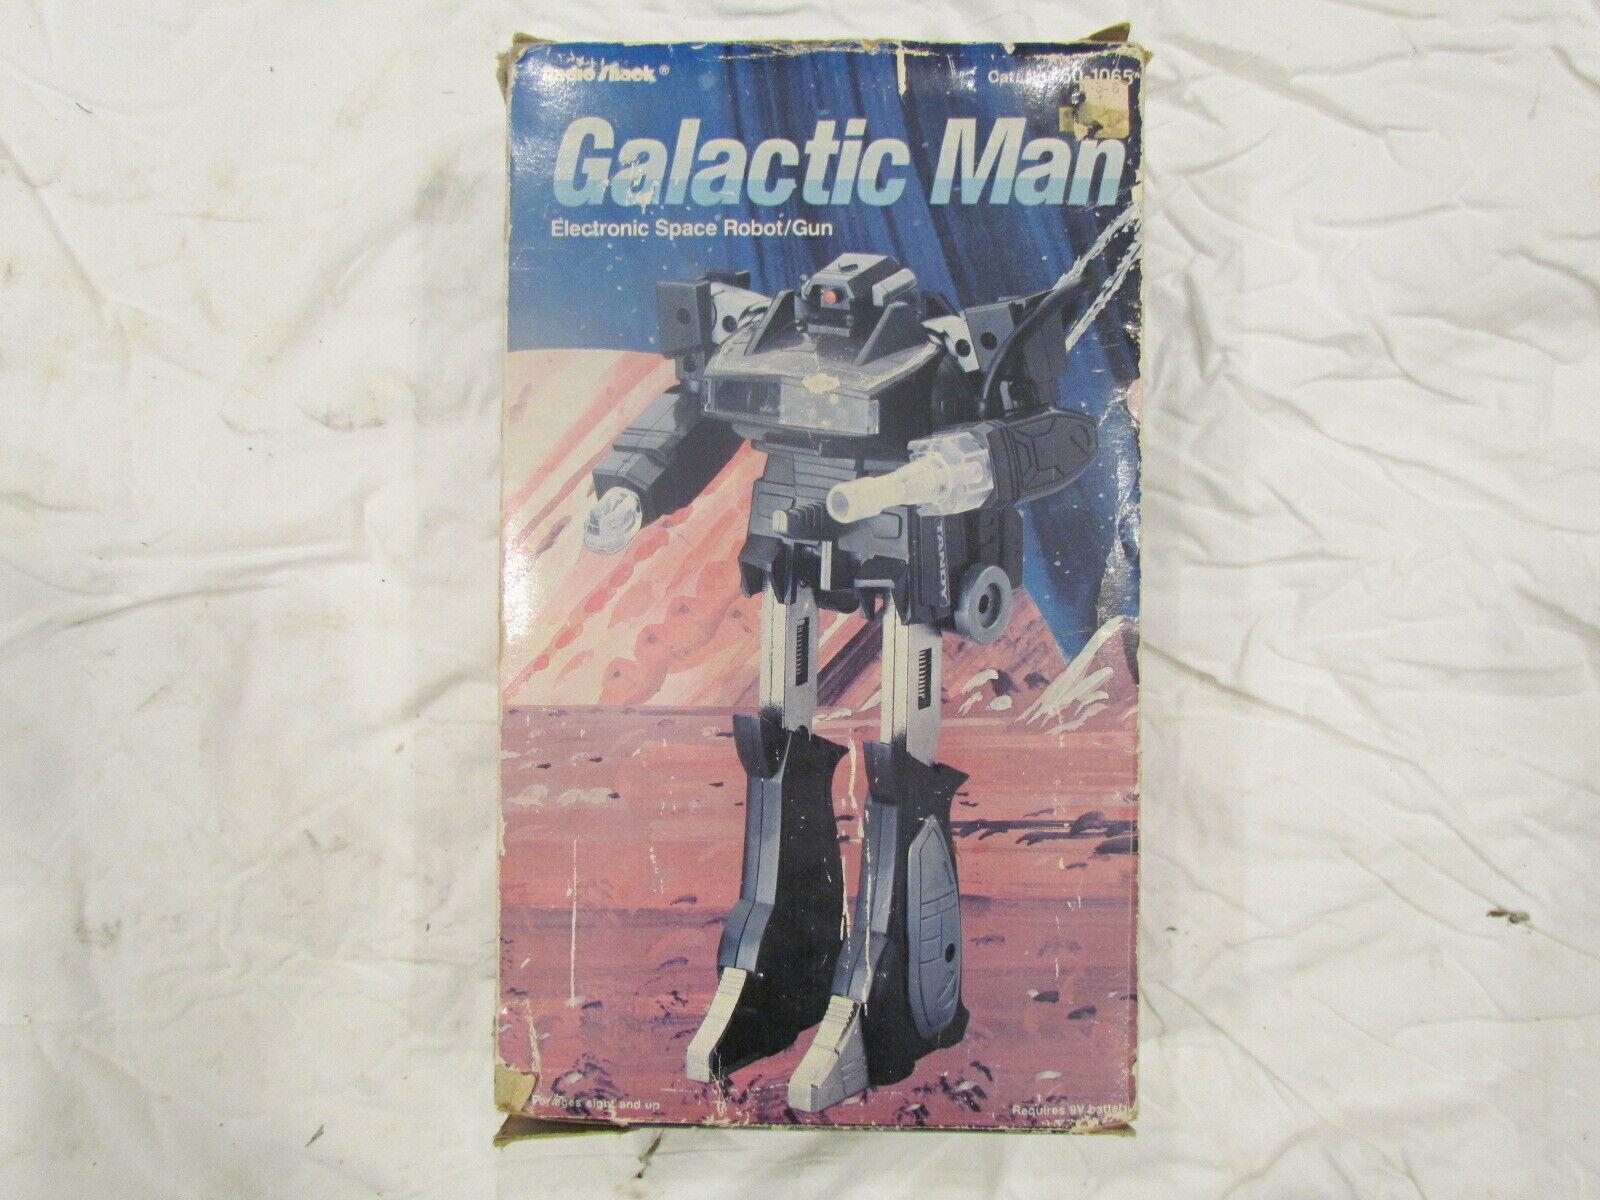 Galactic Man Transformers ToyCo 1983 G1 Shackwave Shockwave 100% Complete Works